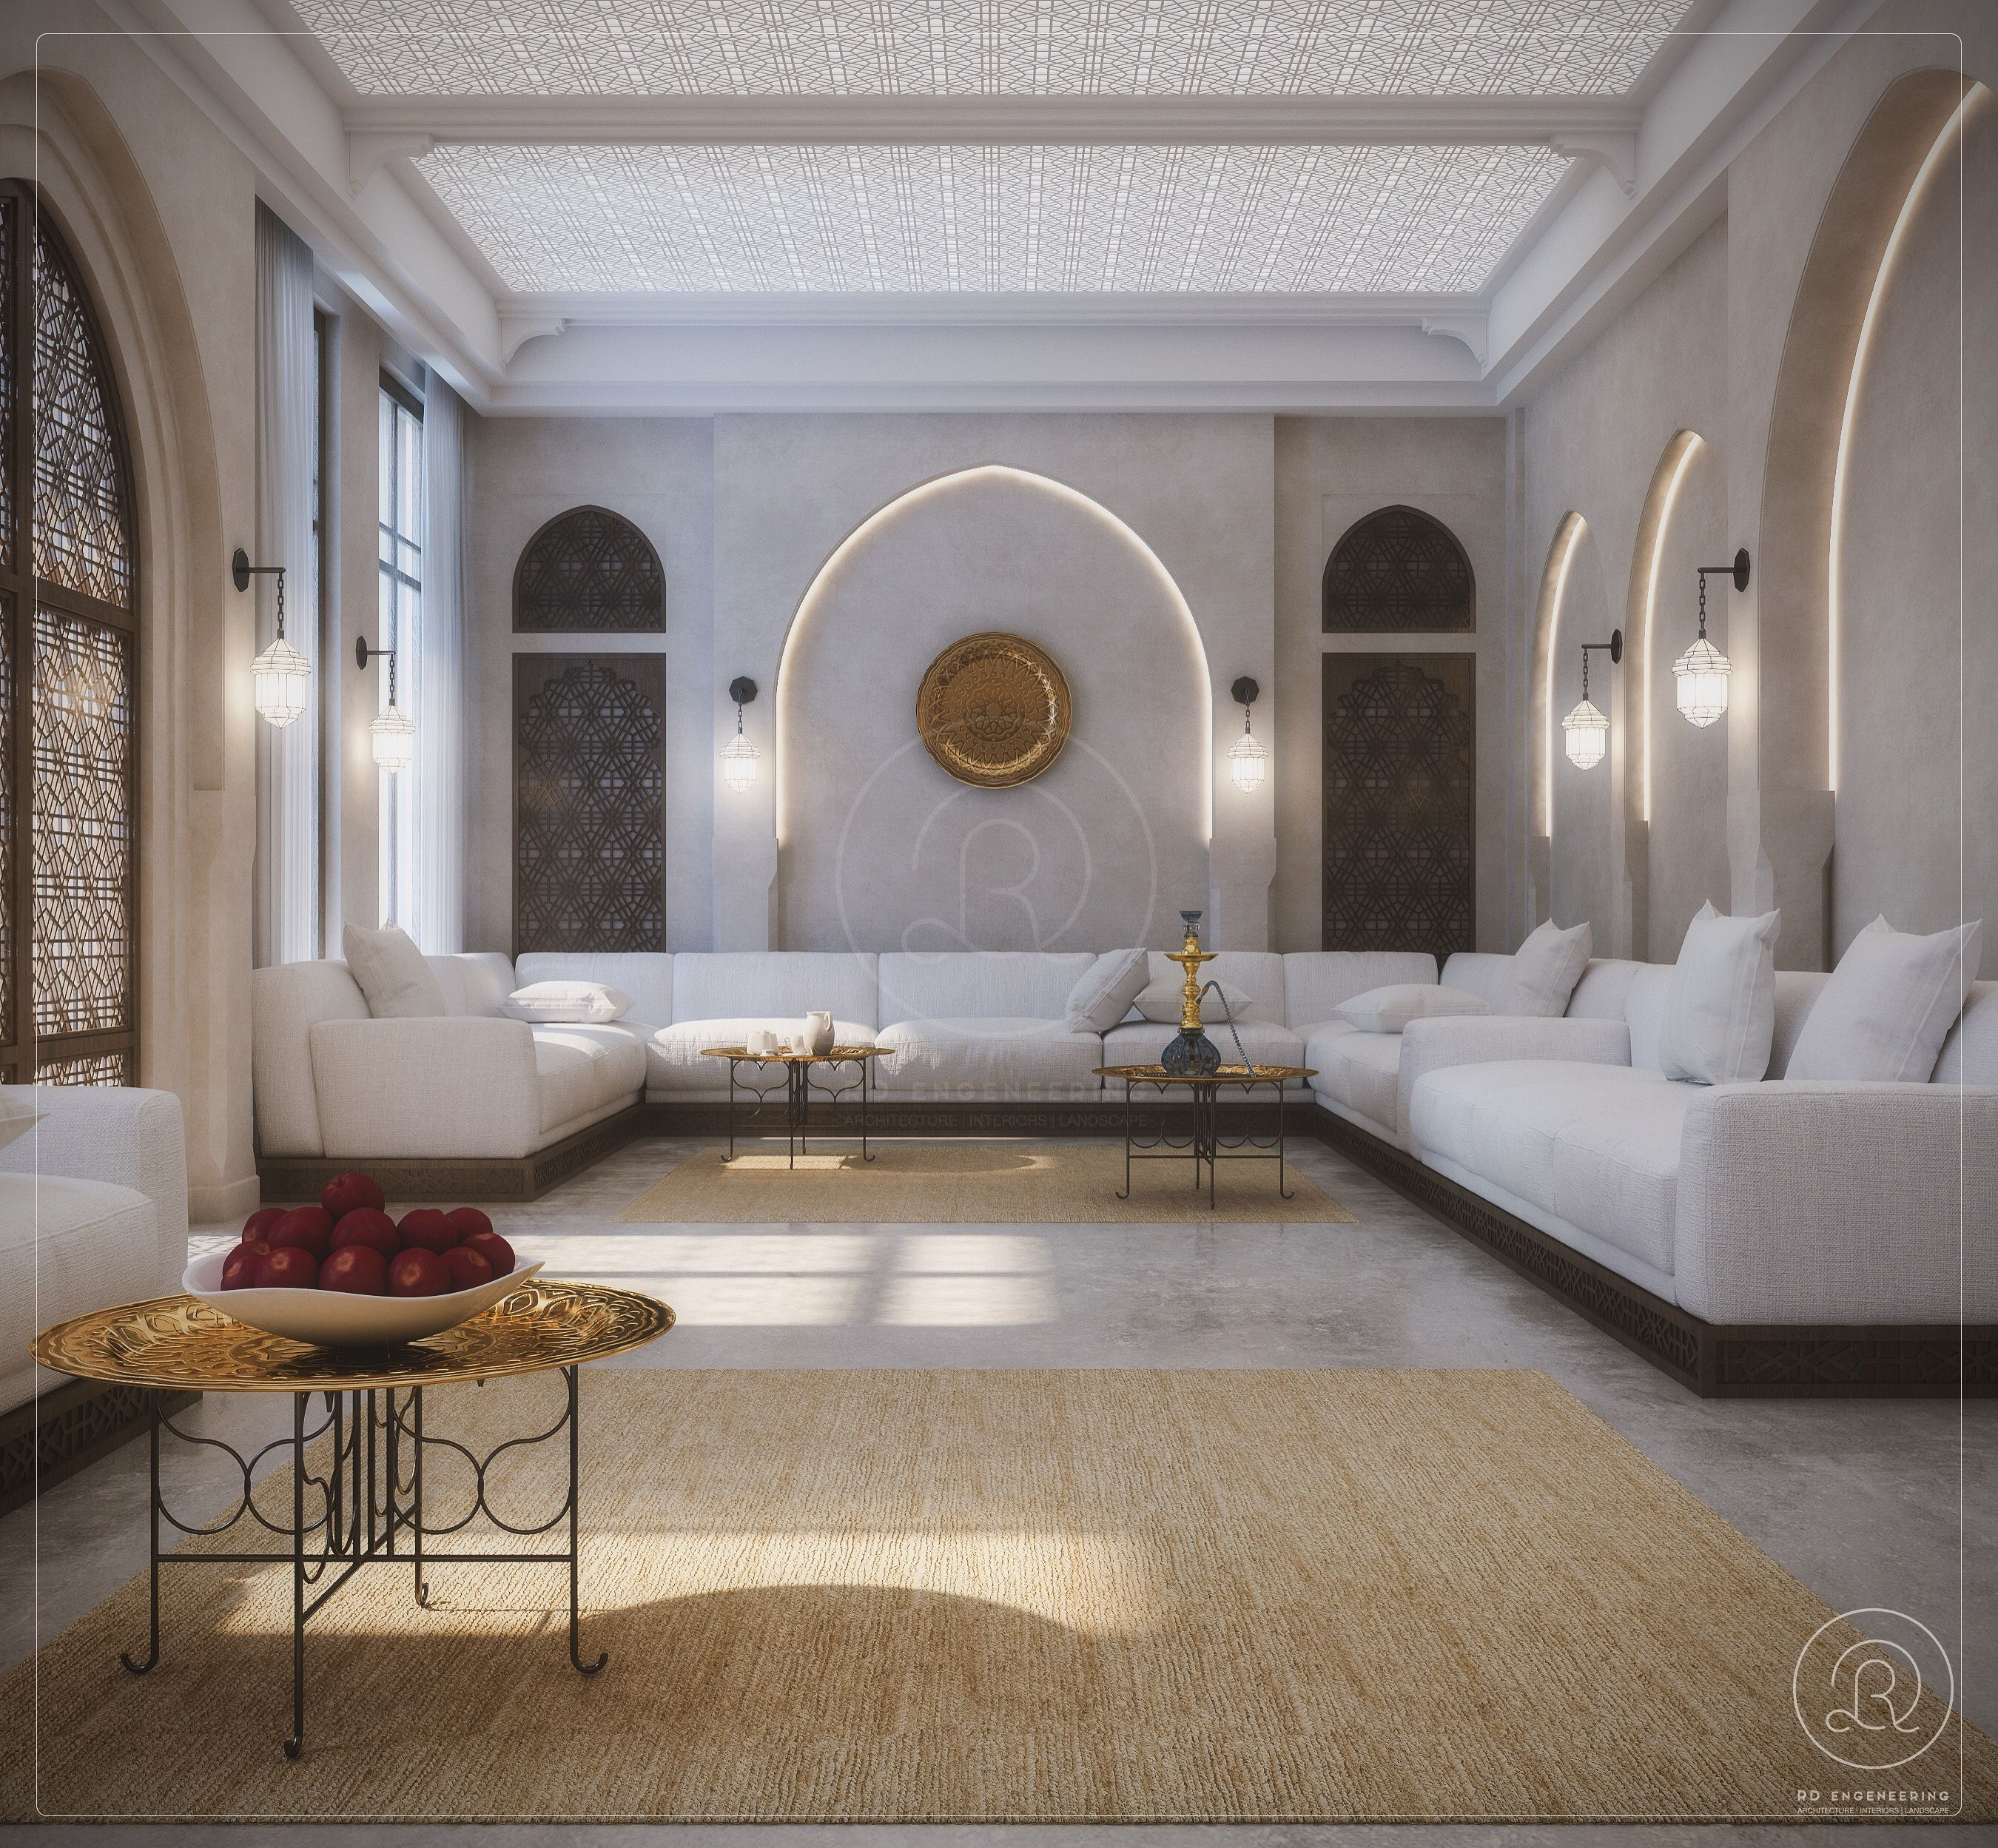 Majles By Rde Qatar Interior Design Design Interior